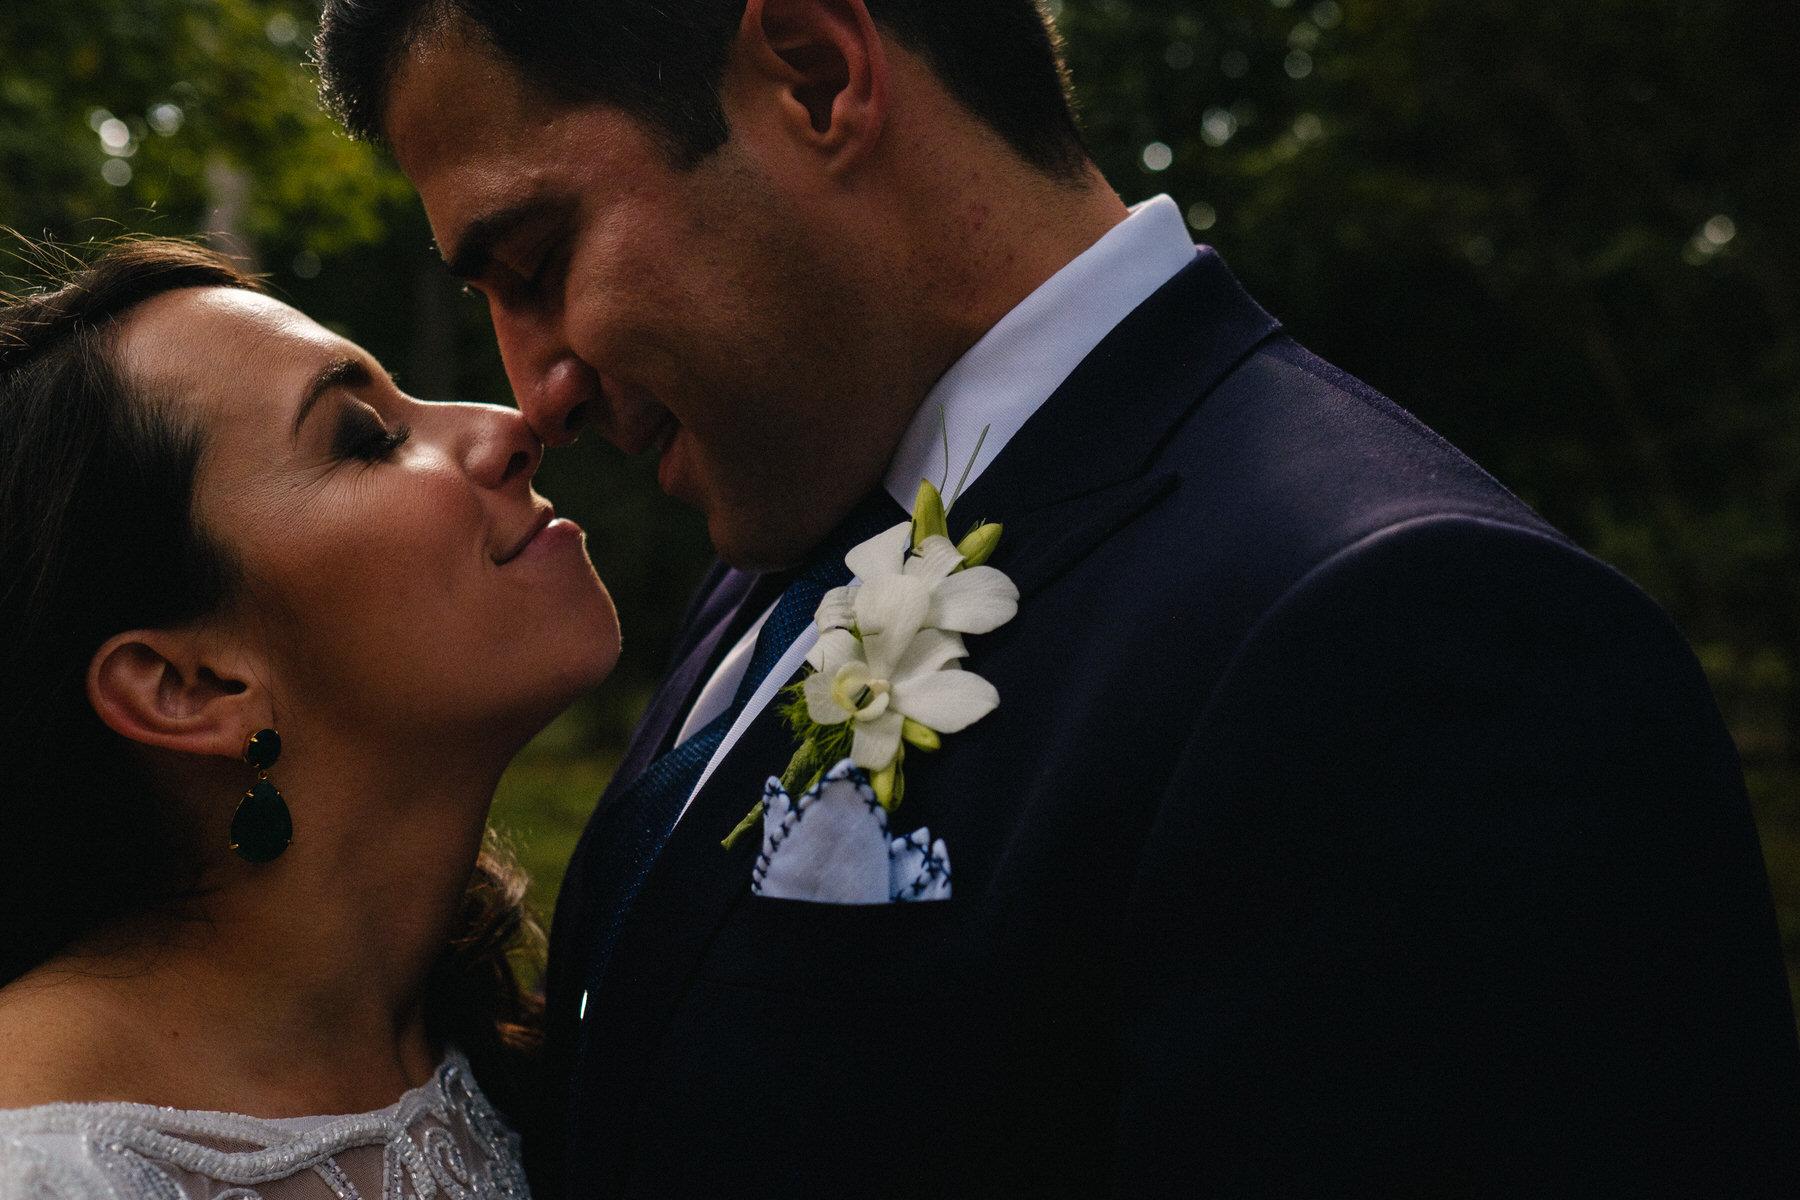 Oxford_mississippi_wedding_photographer_038.jpg